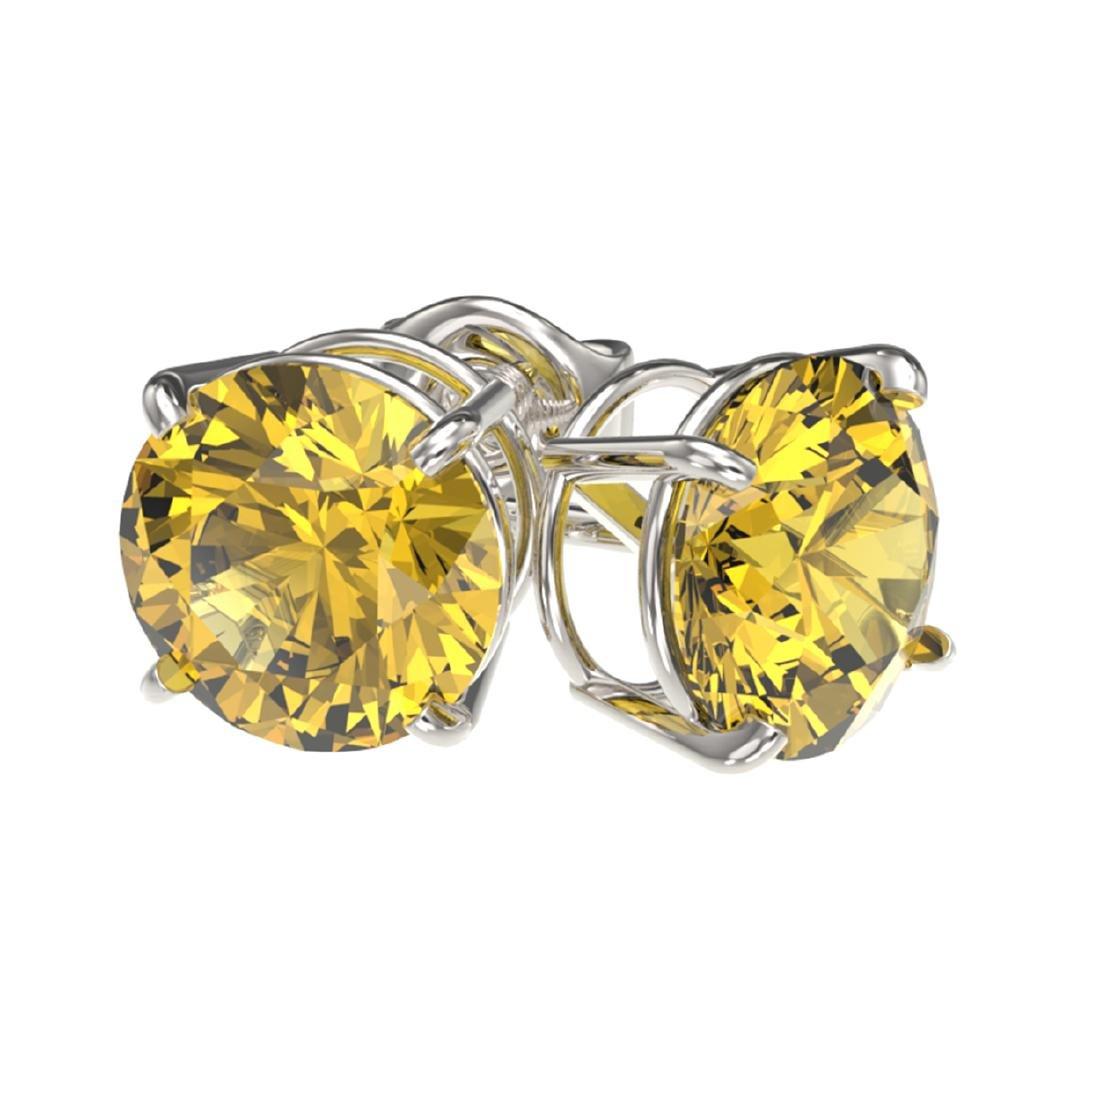 1.92 ctw Intense Yellow Diamond Stud Earrings 10K White - 3